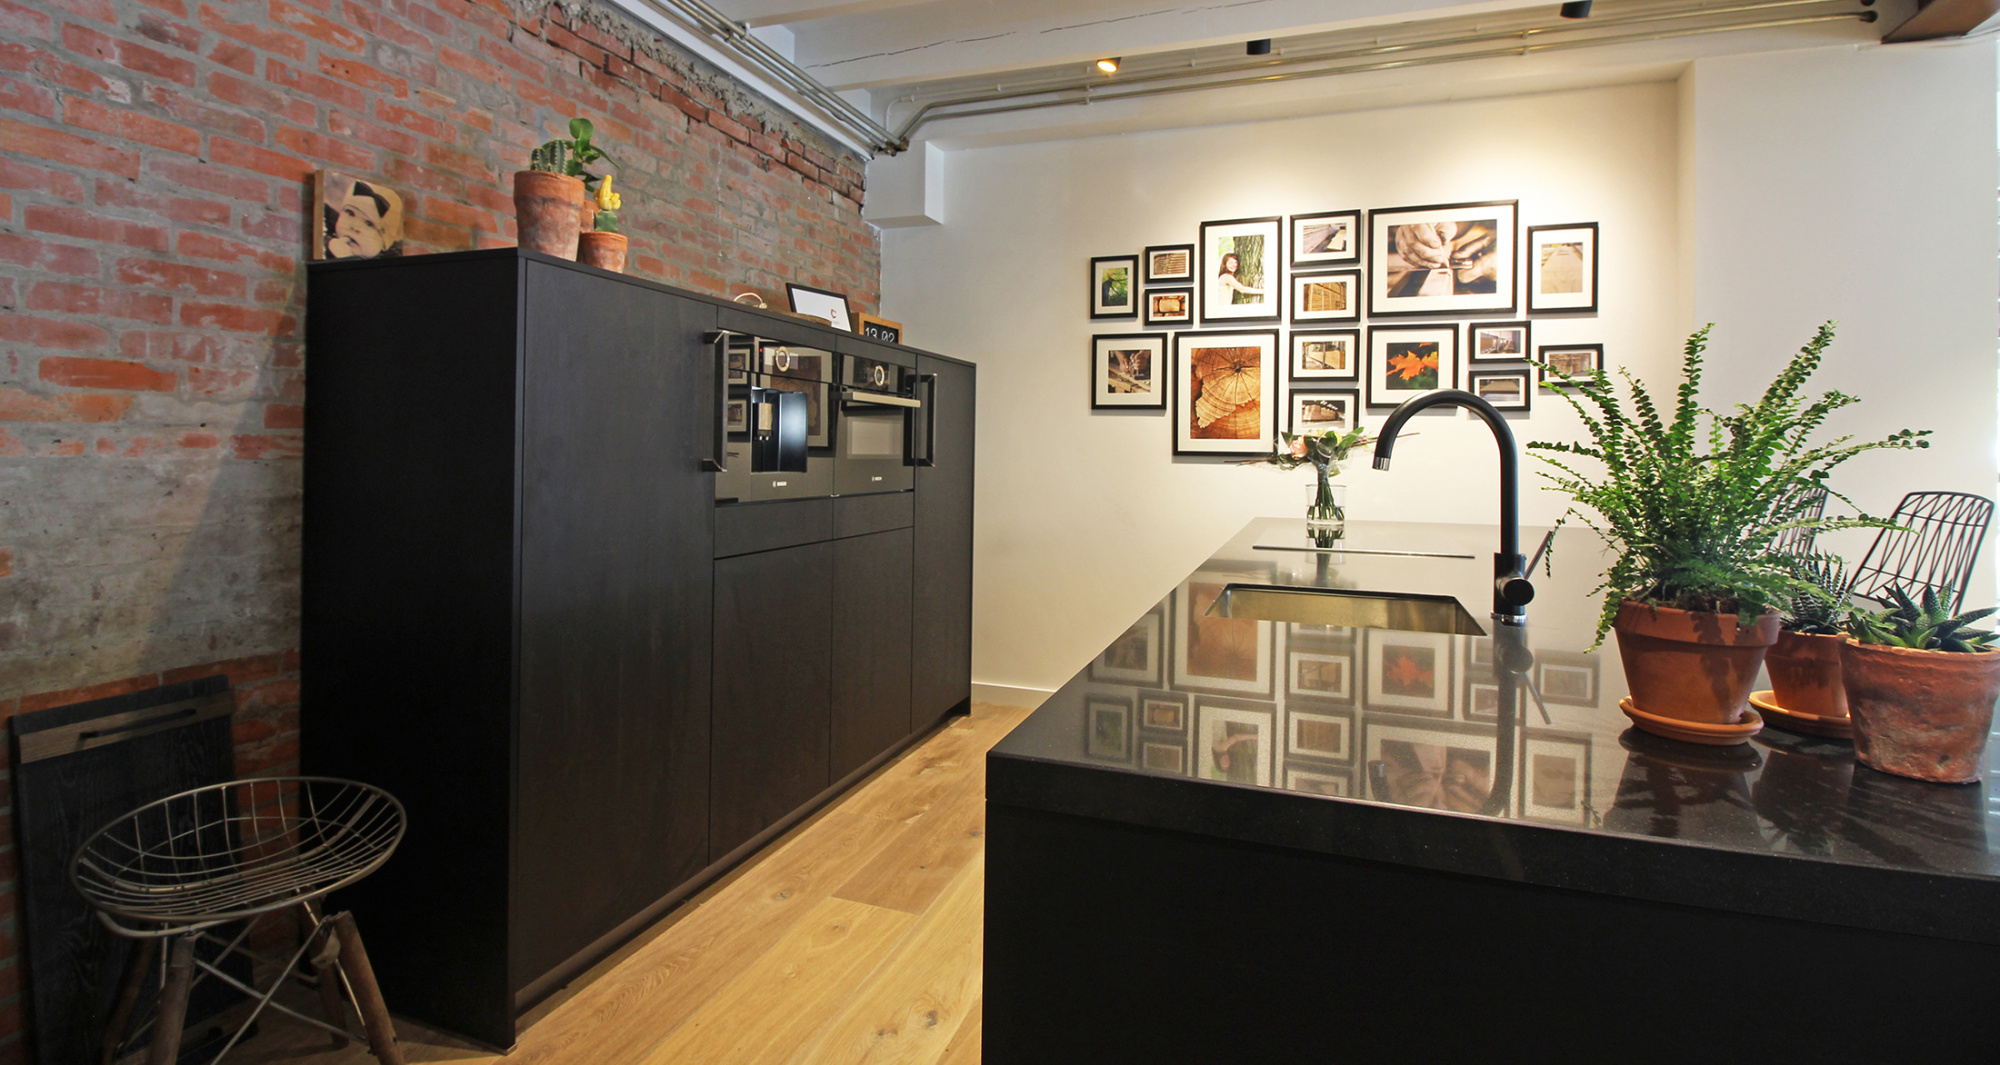 Keuken Zwart Stoere : Prachtige zwarte keuken inhuis keukens